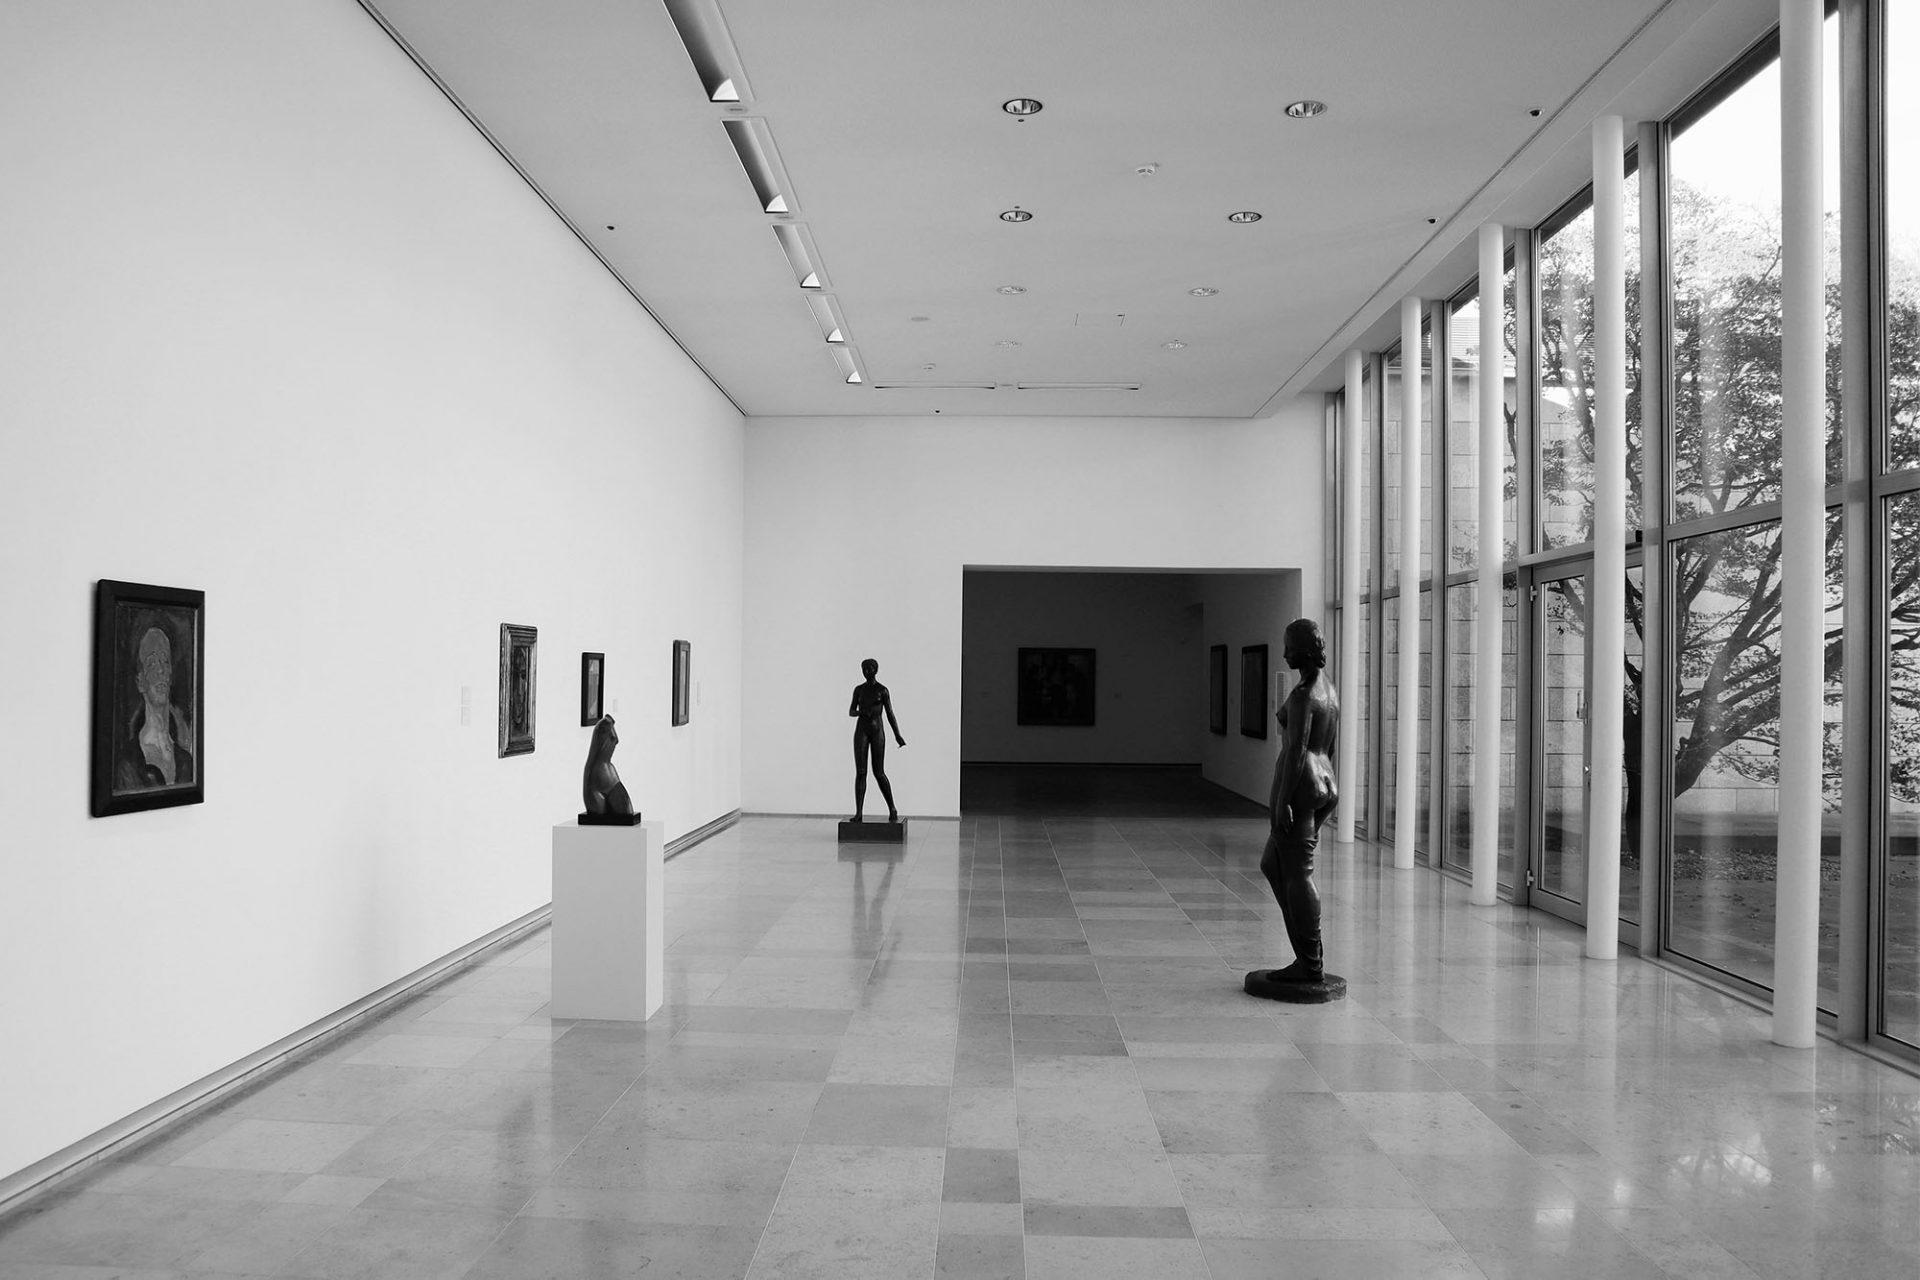 Museum Folkwang. Ursprünglicher Bau: Horst Loy mit W. Kreutzberger und E. Hösterey. Fertigstellung. 1960.